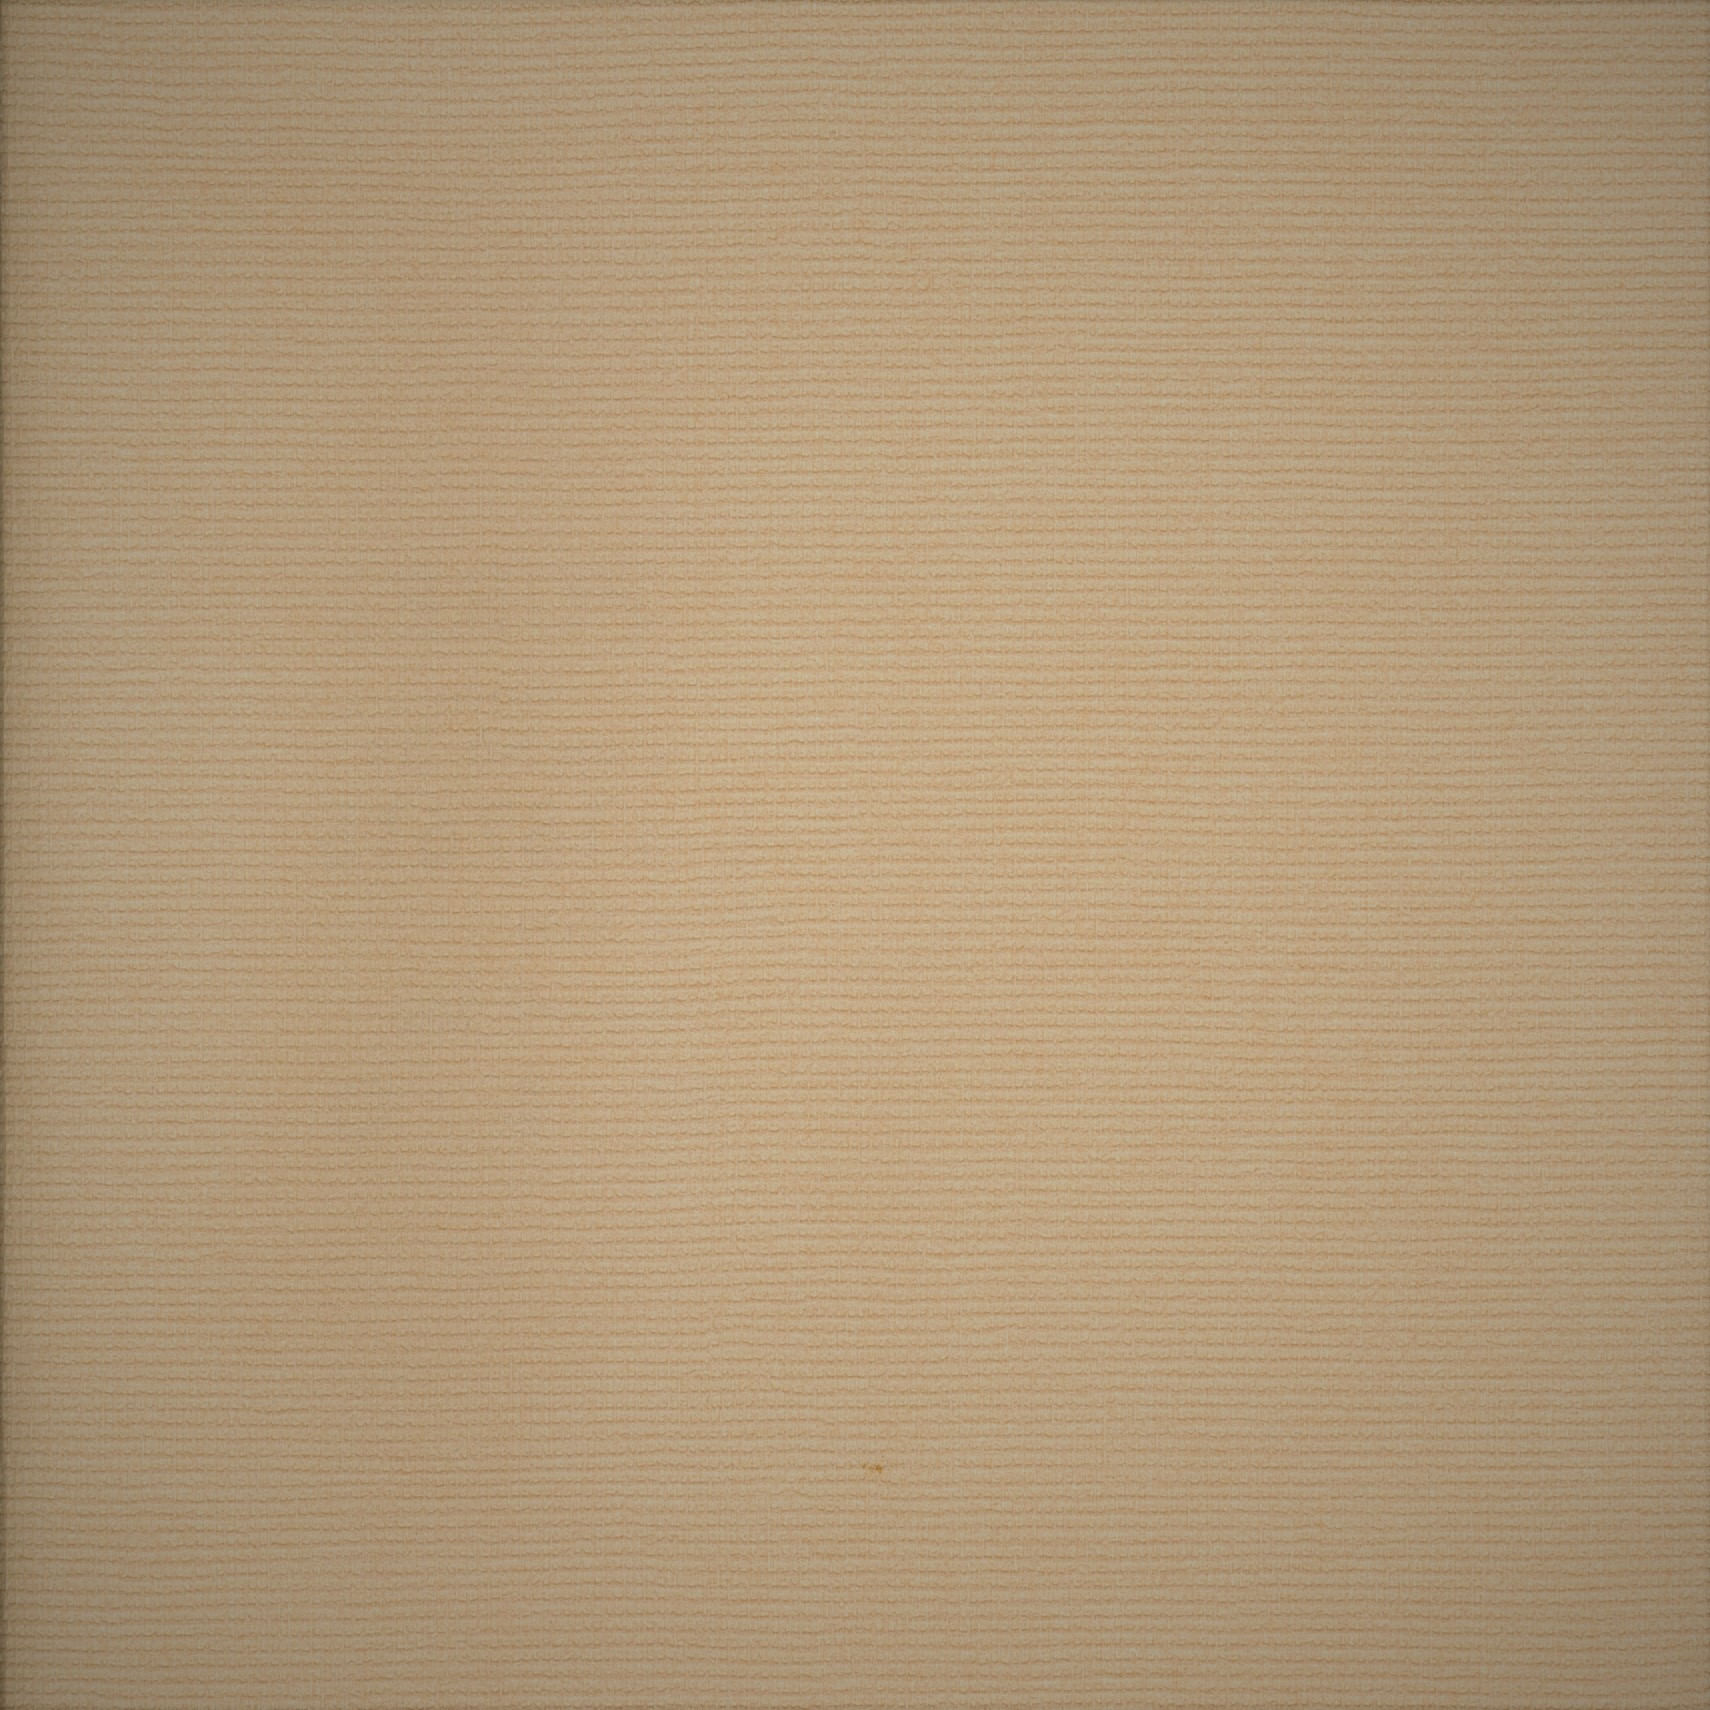 Papel de Parede Pure 2 Tramado 187615 - Rolo: 10m x 0,53m